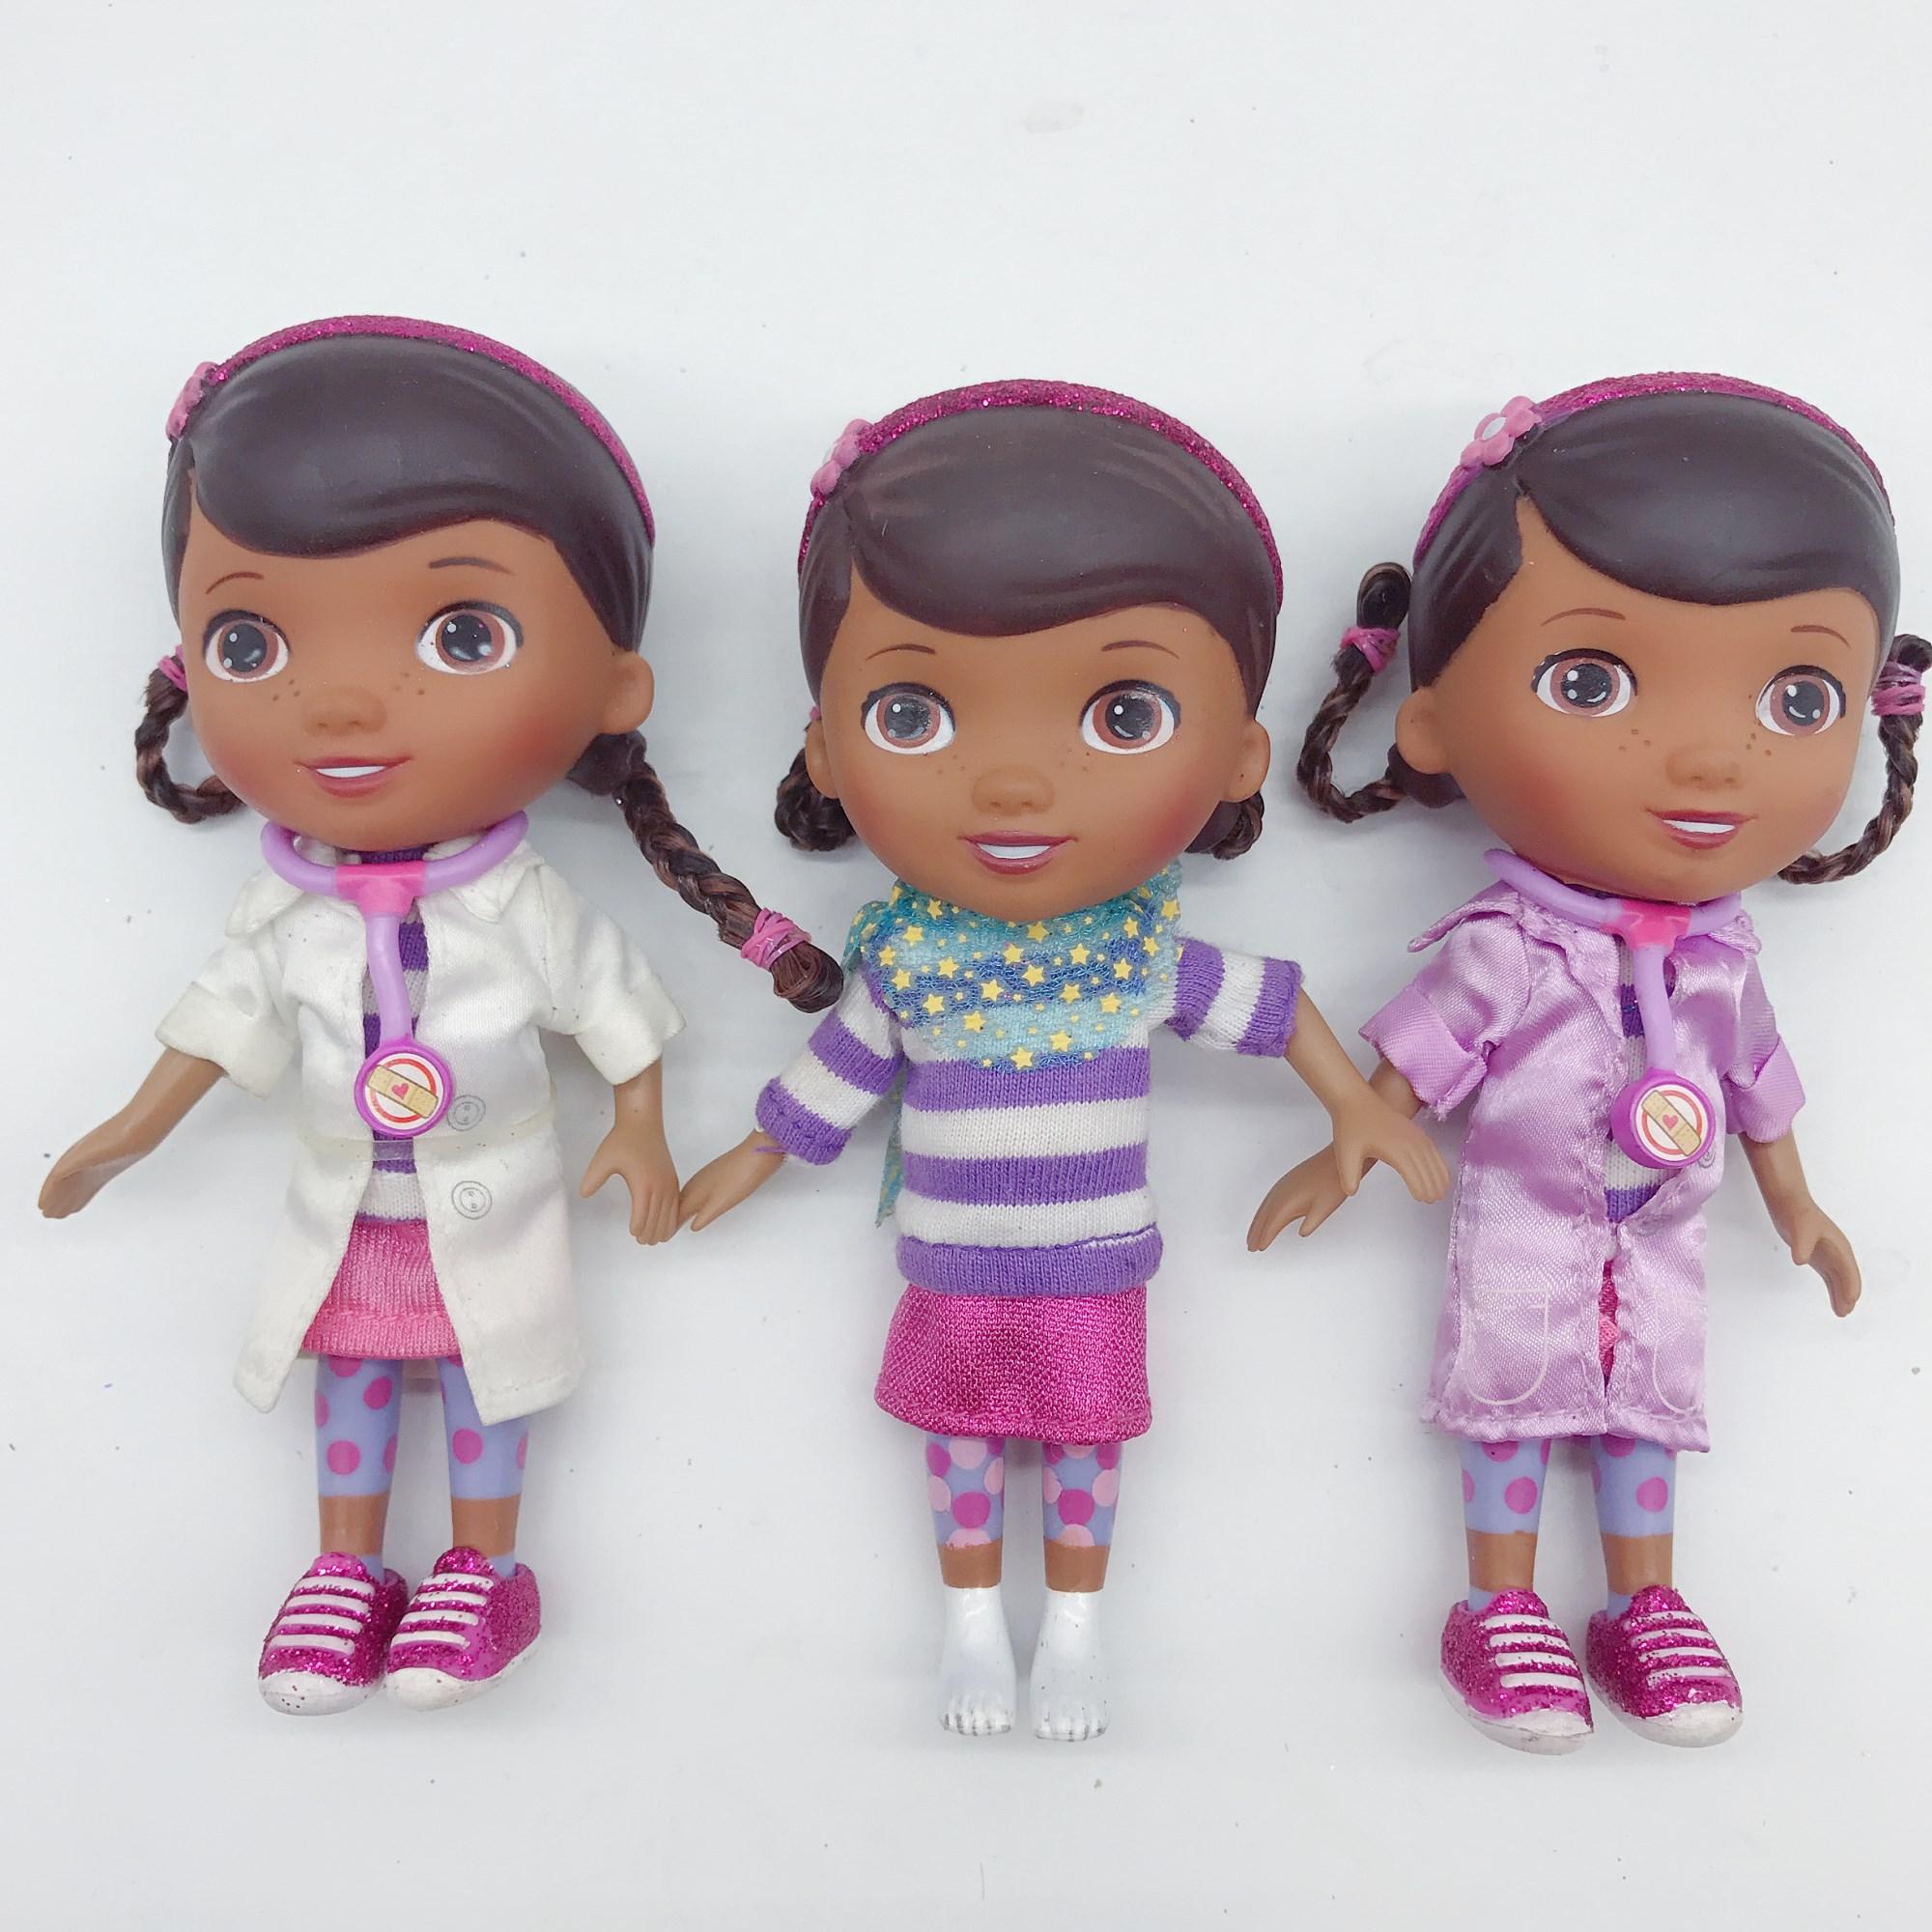 New Toys 13cm Doc McStuffins Dottie Doctor Friends Girls Action Figure Toys Girls Dolls Gifts